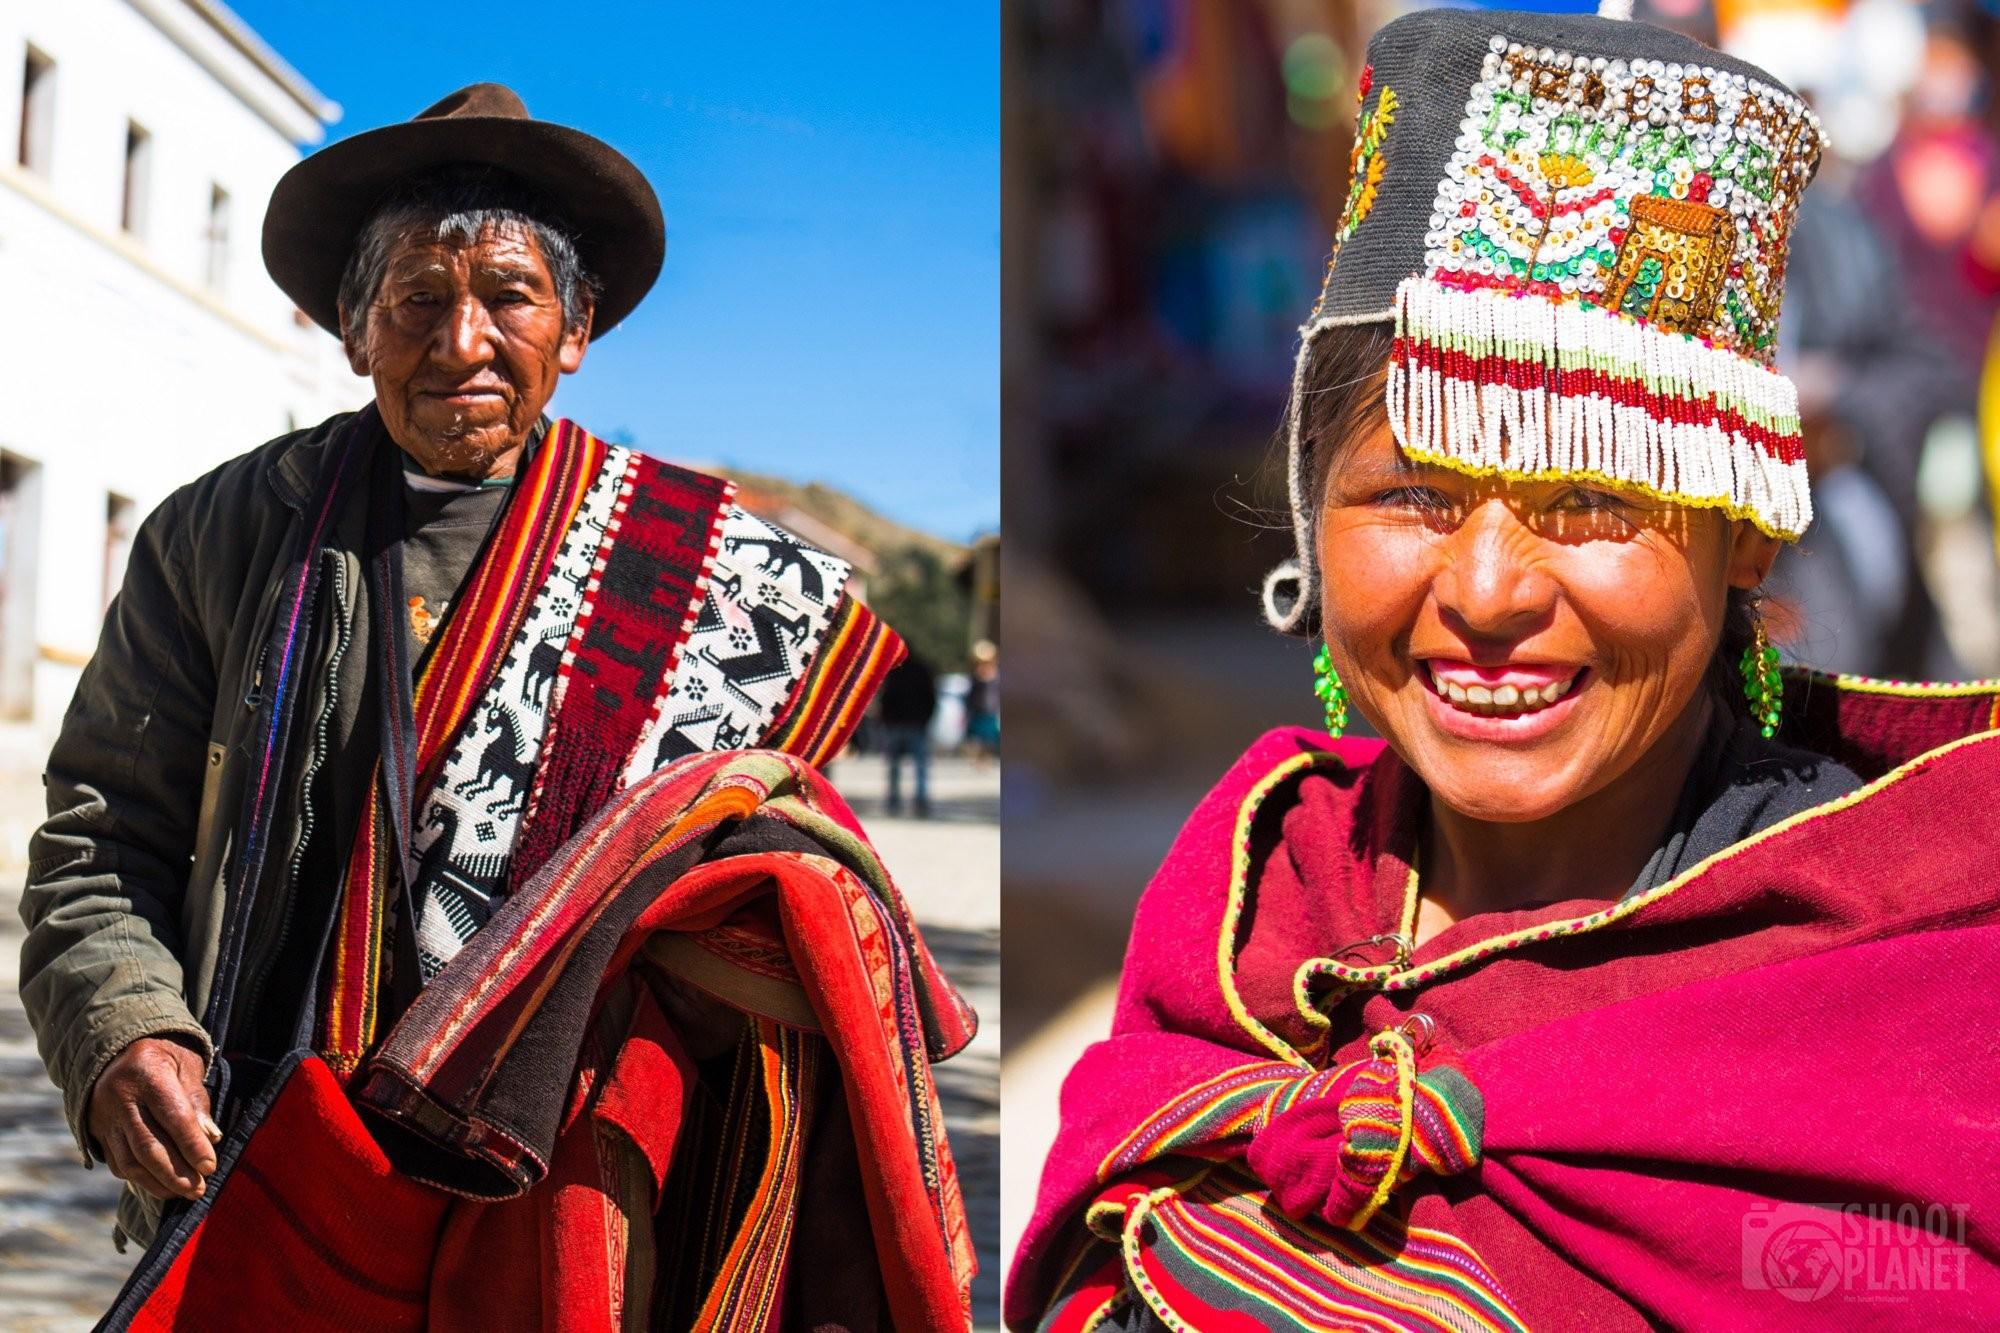 Indigenous people in Tarabuco market, Bolivia